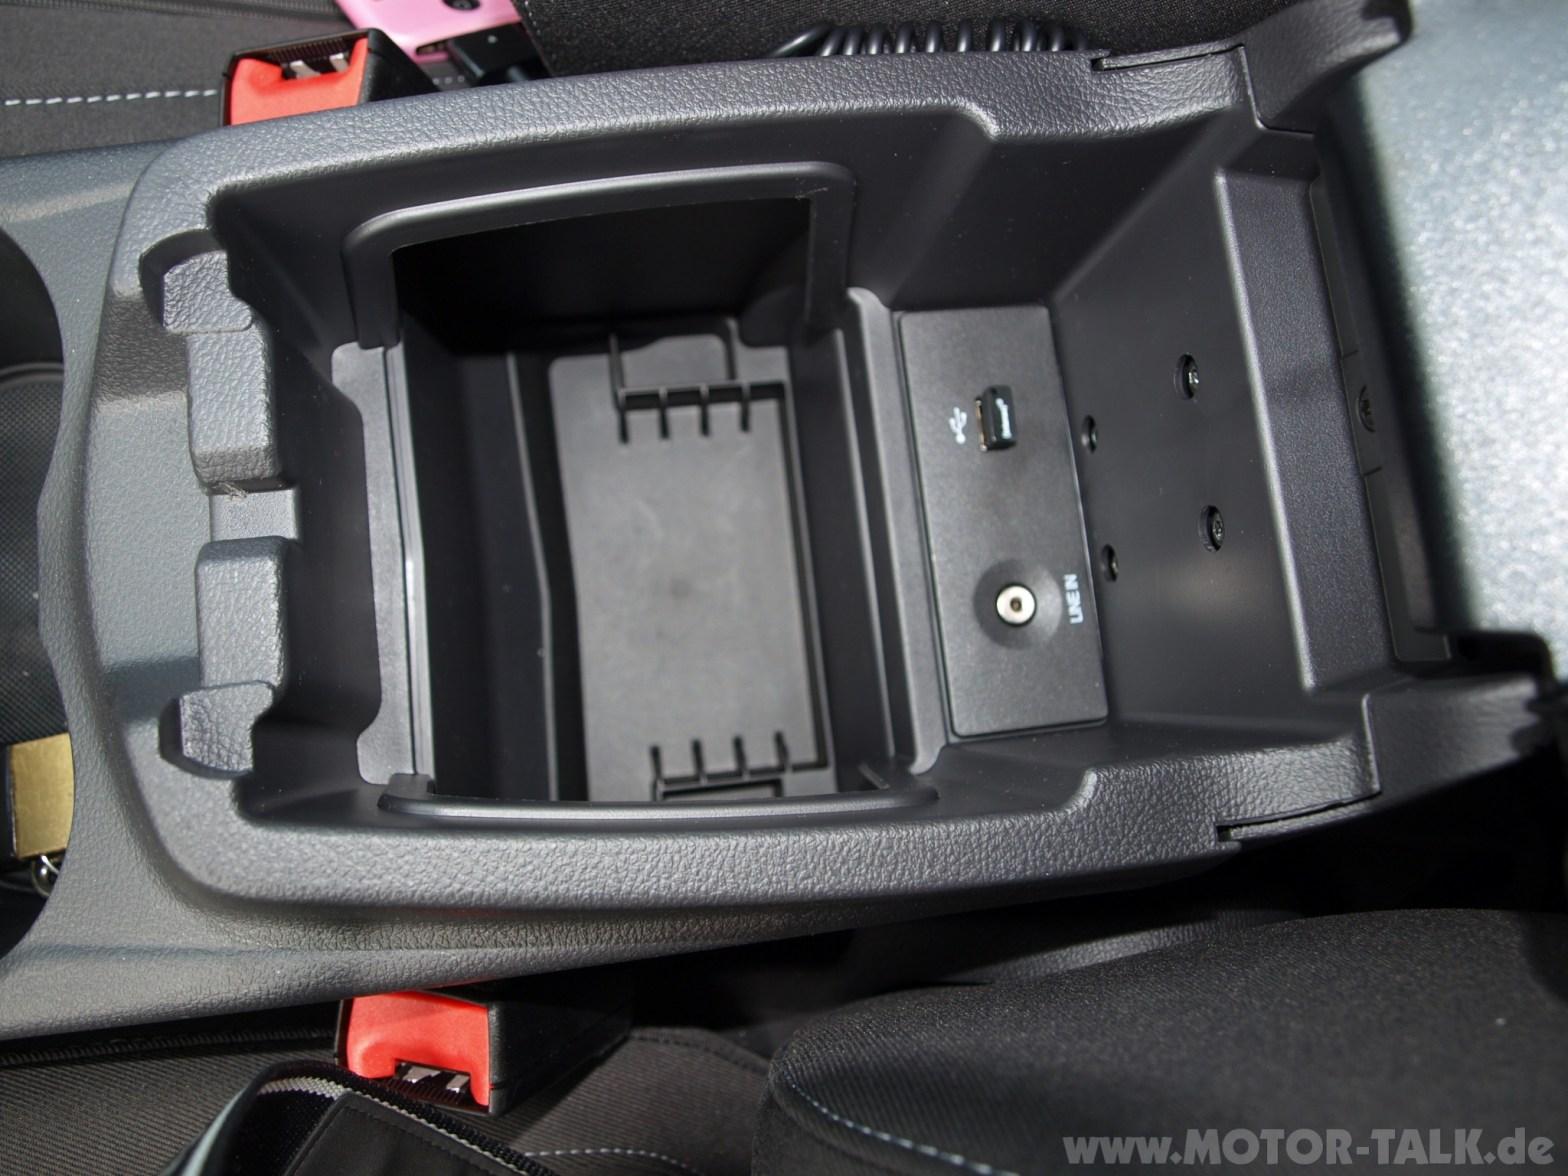 Ford Sync USB devices | David Artiss